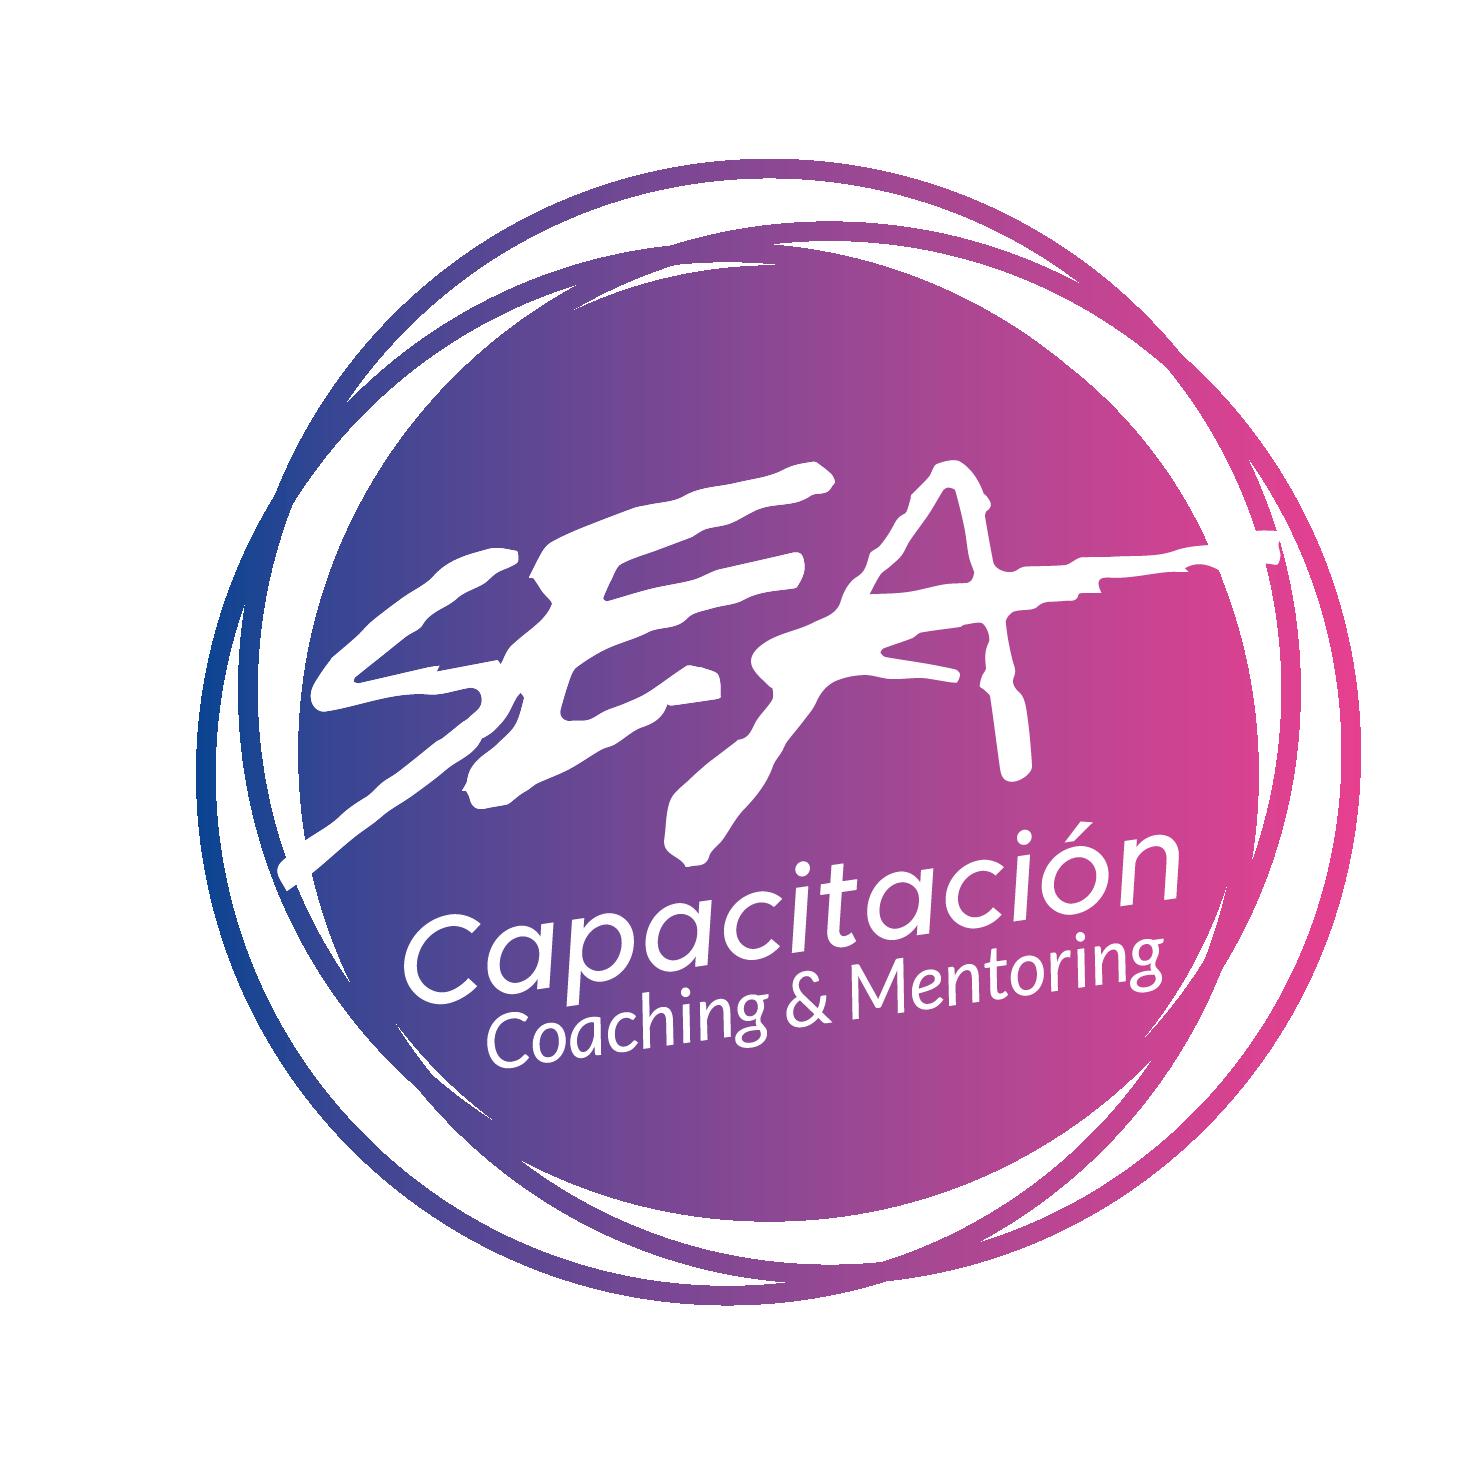 Logo_capacitacio¦ün-07